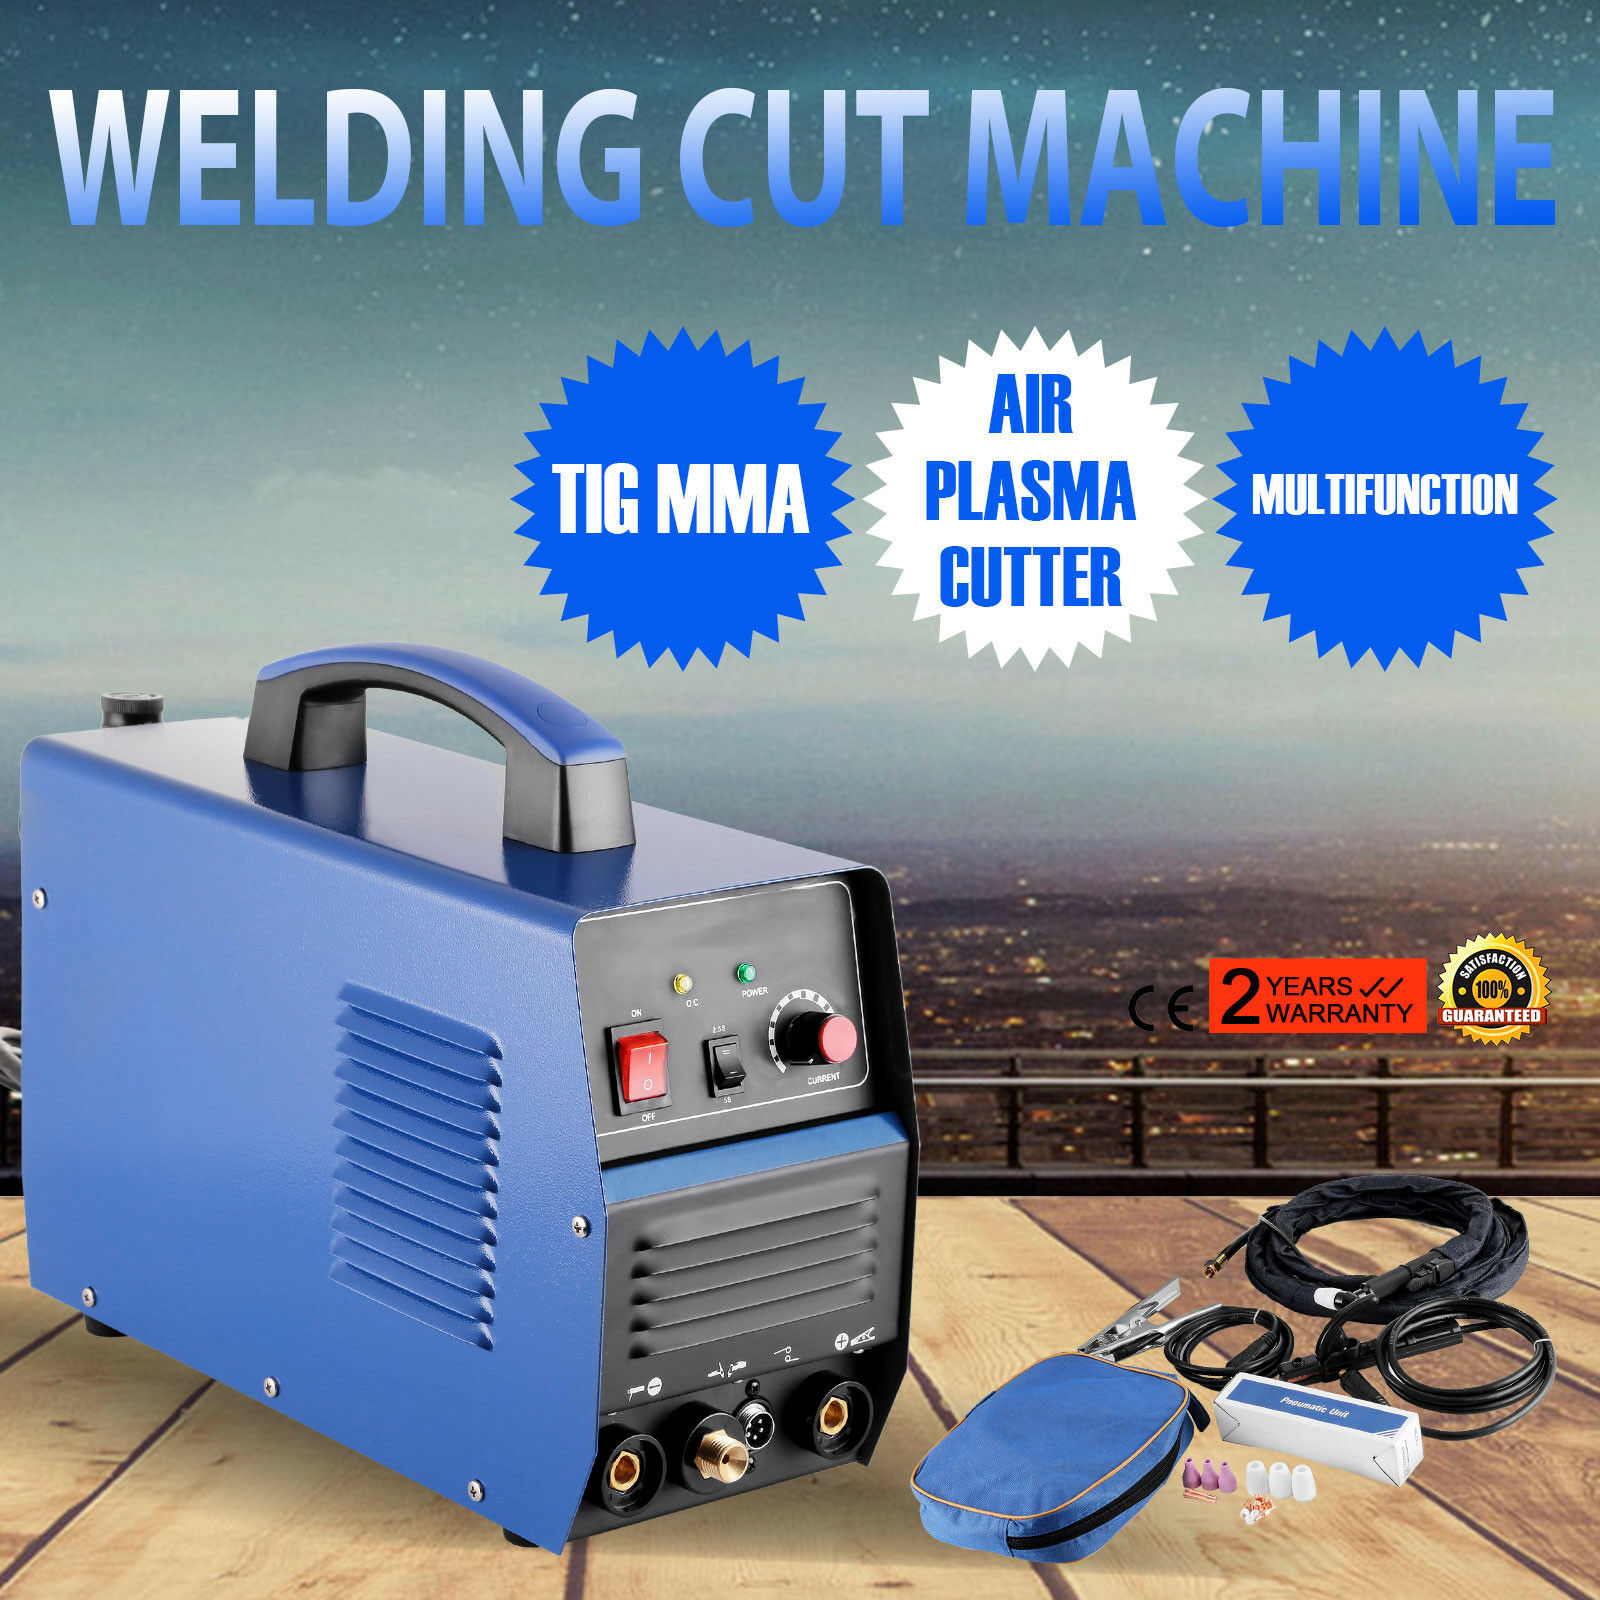 Welding Machine Inverter 3 In 1 Functional Plasma Cutter/TIG/MMA 30A/120A Welder